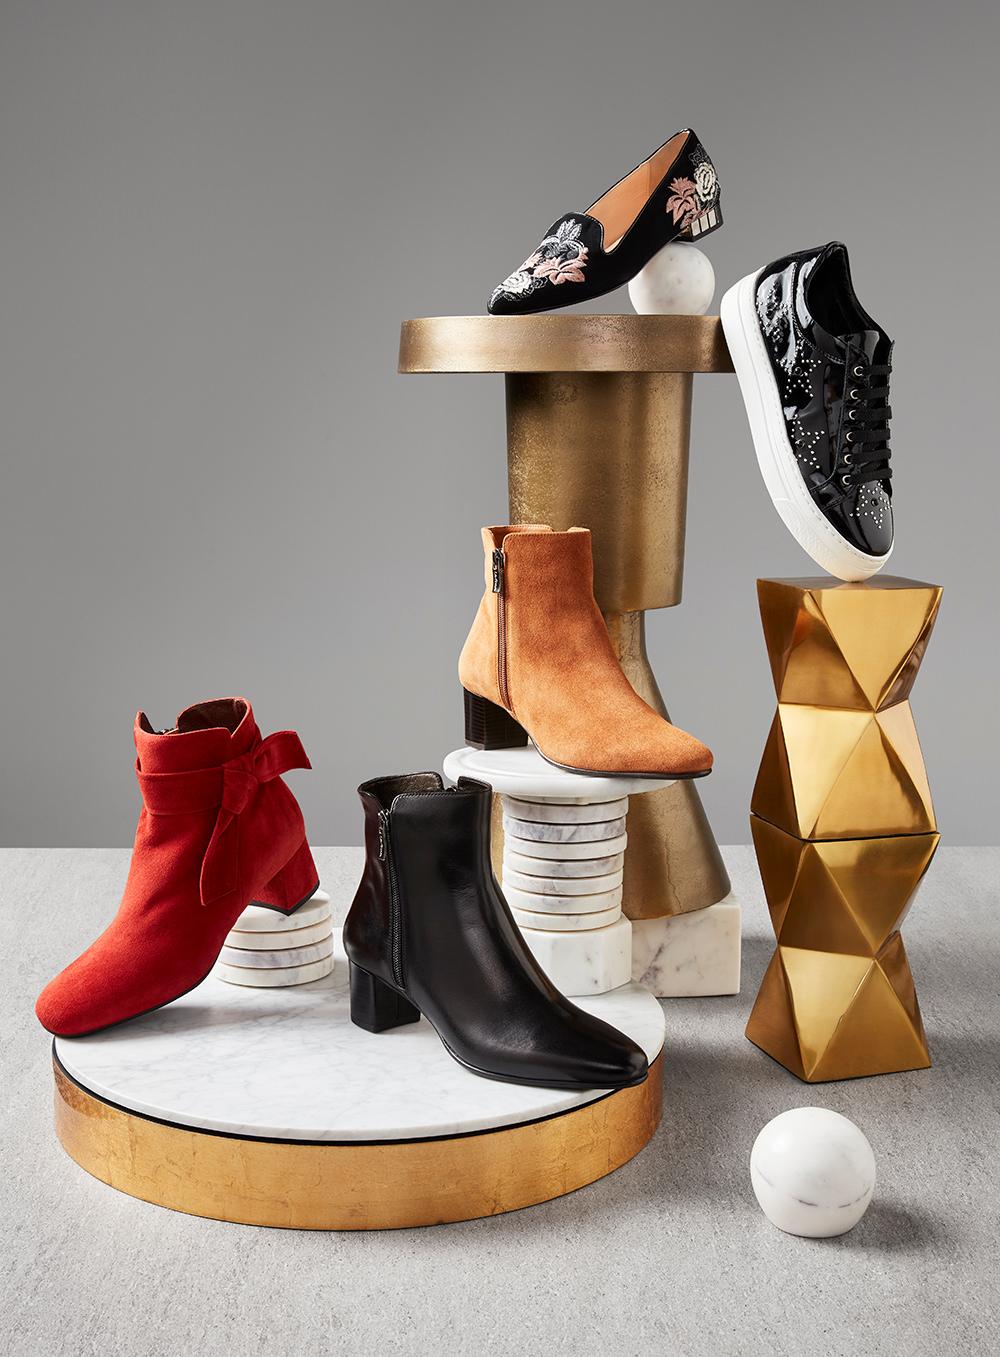 ladies winter shoe lookbook shot by wow pictures studios